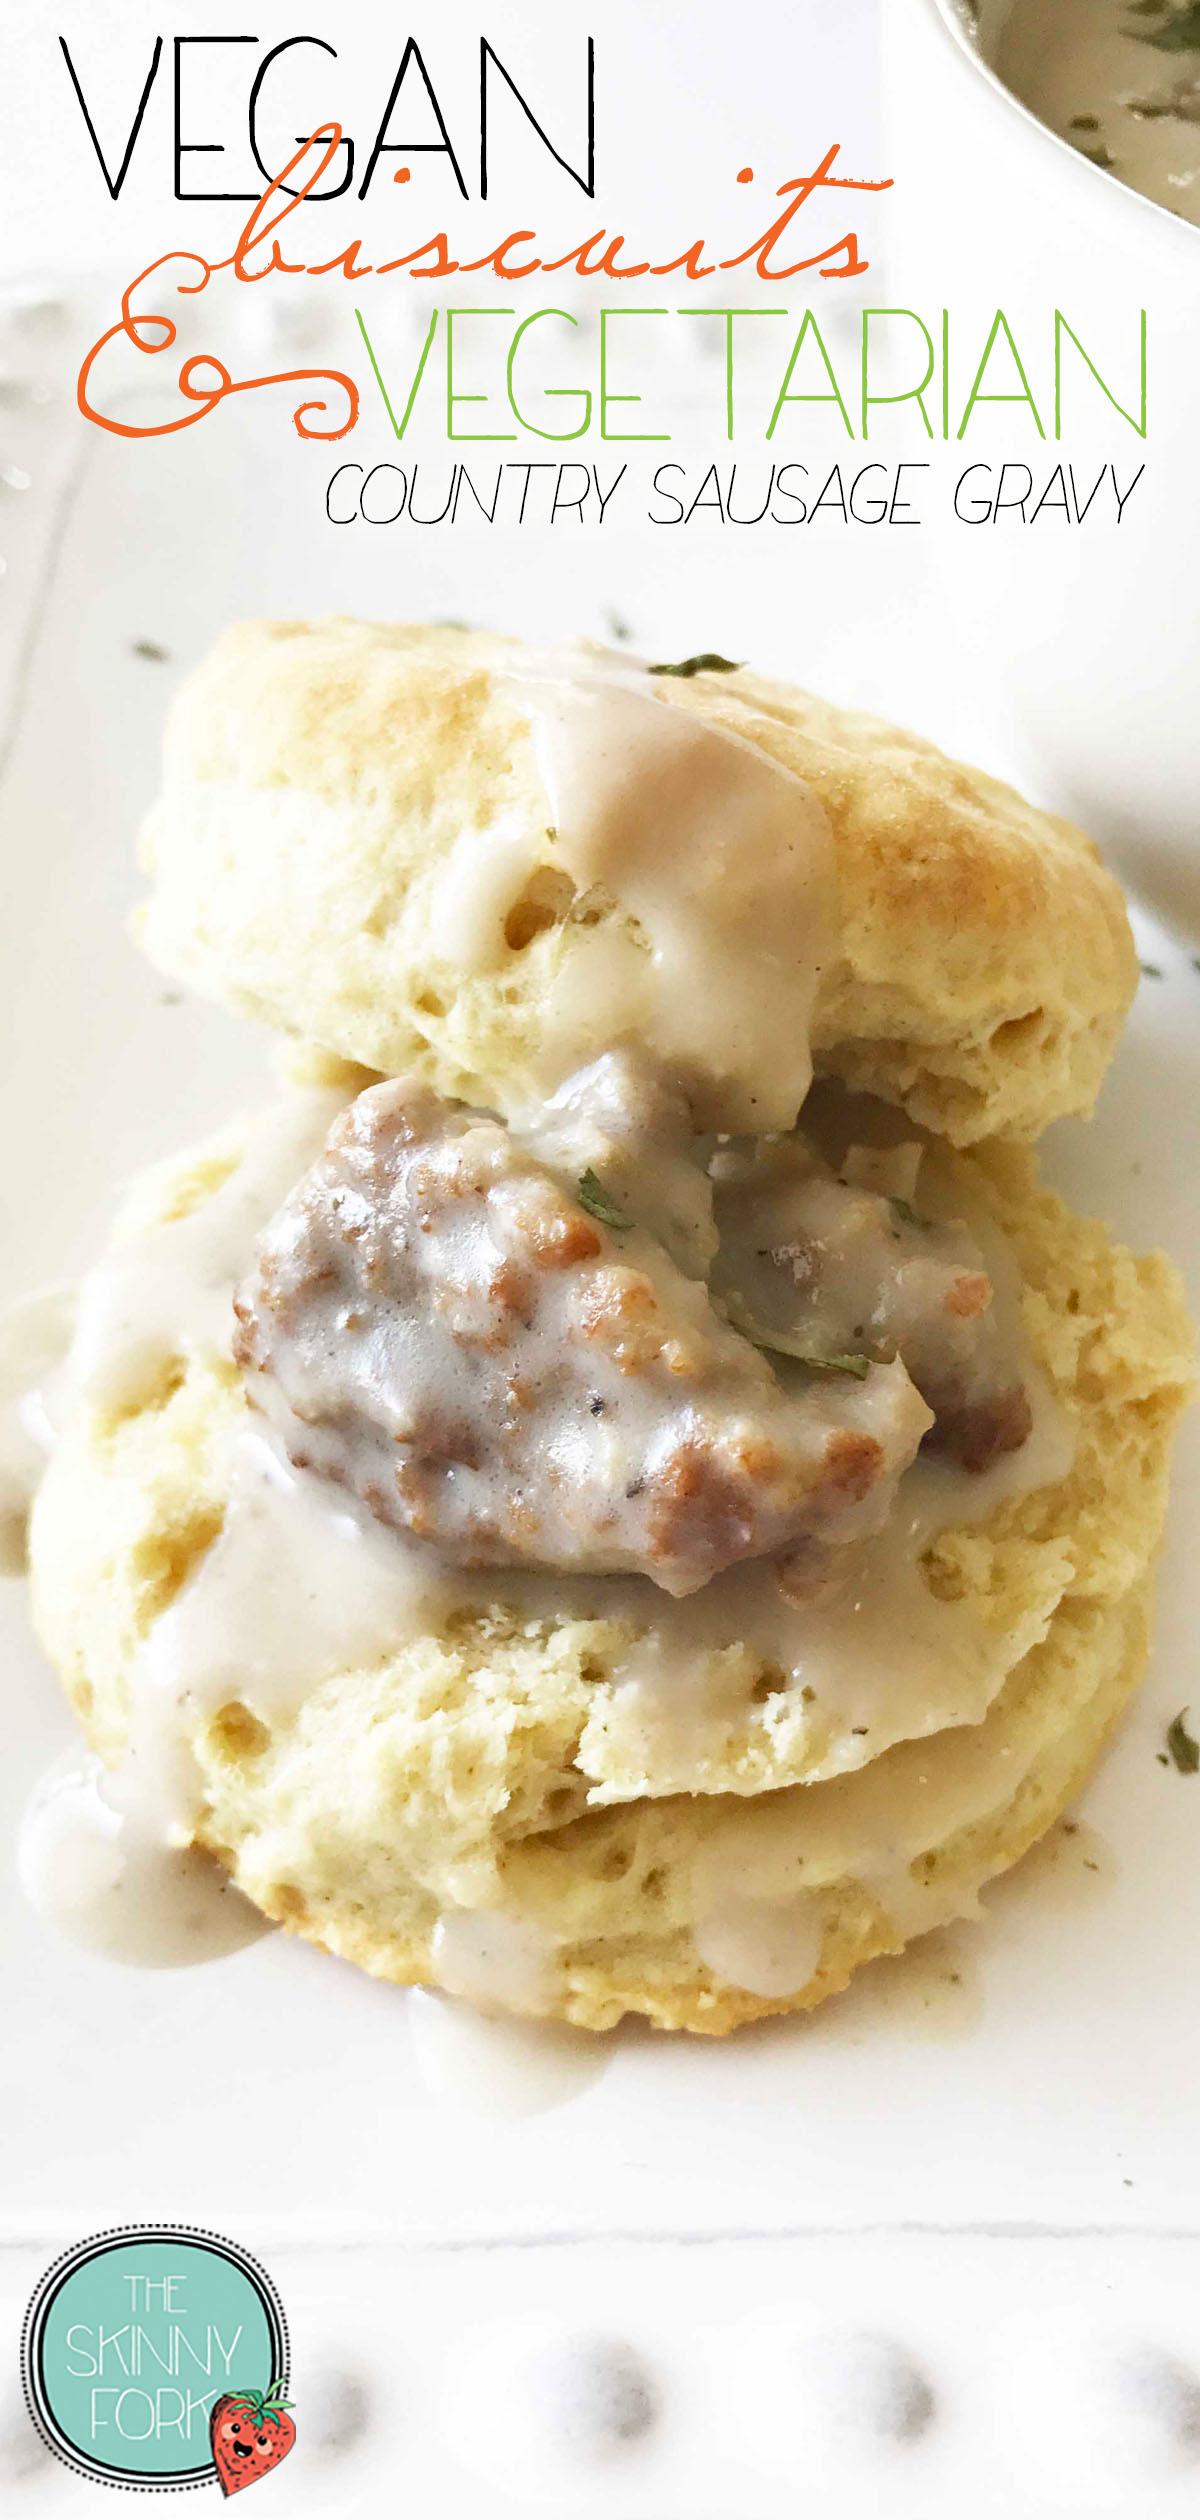 Vegan Biscuits & Vegetarian Country Sausage Gravy